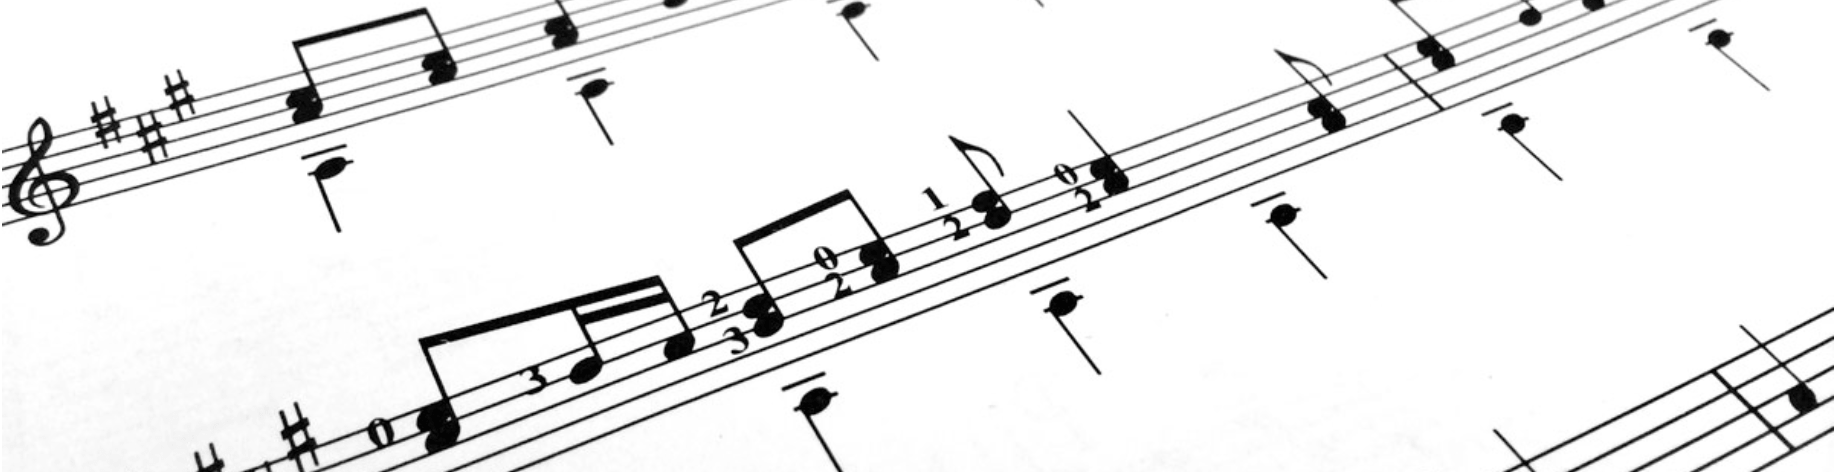 cymatics-soundfonts-scores